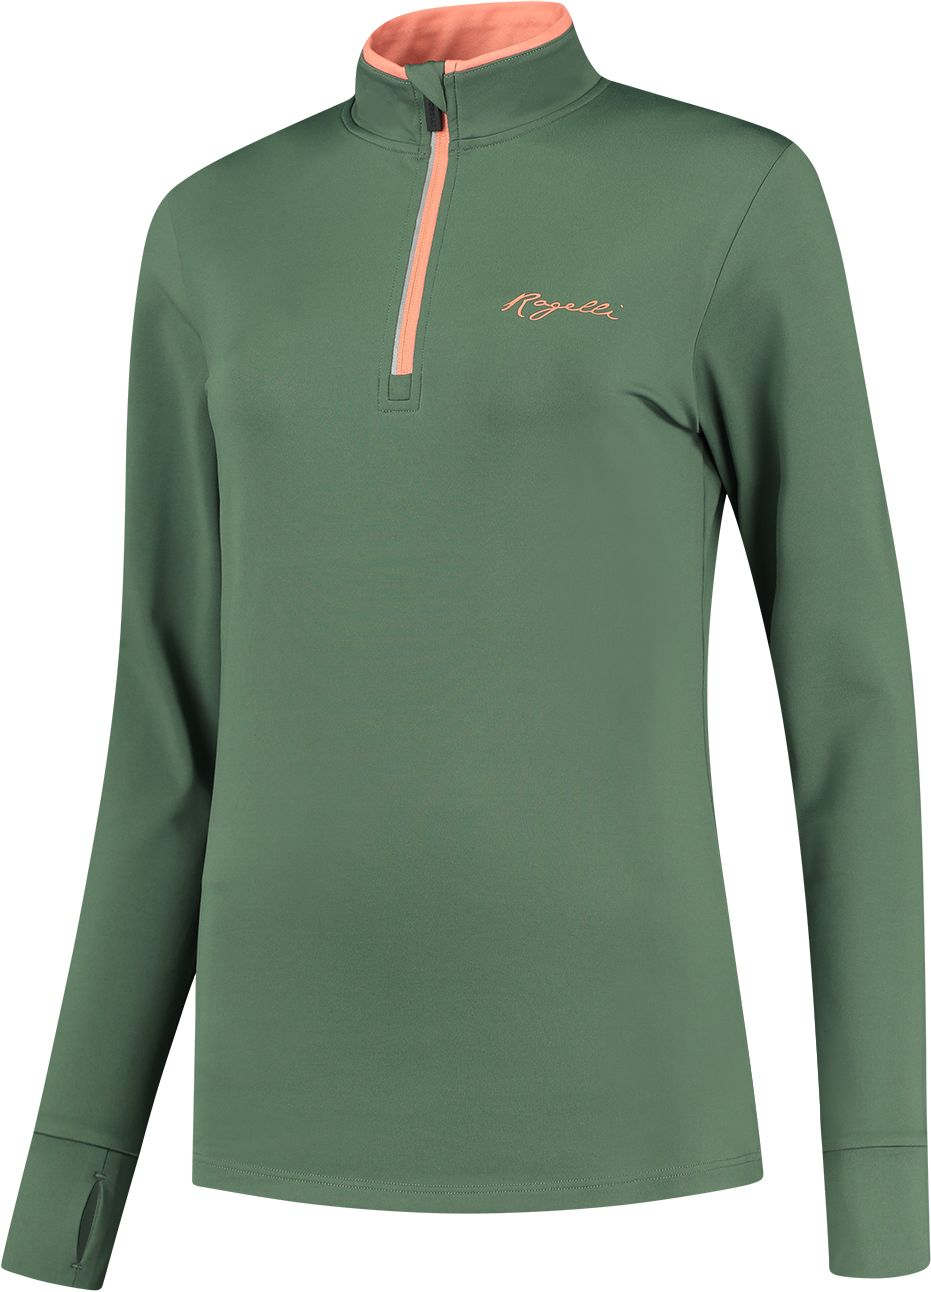 ROGELLI bluza do biegania damska SNAKE green ROG351110 Rozmiar: XL,ROG351110.XS